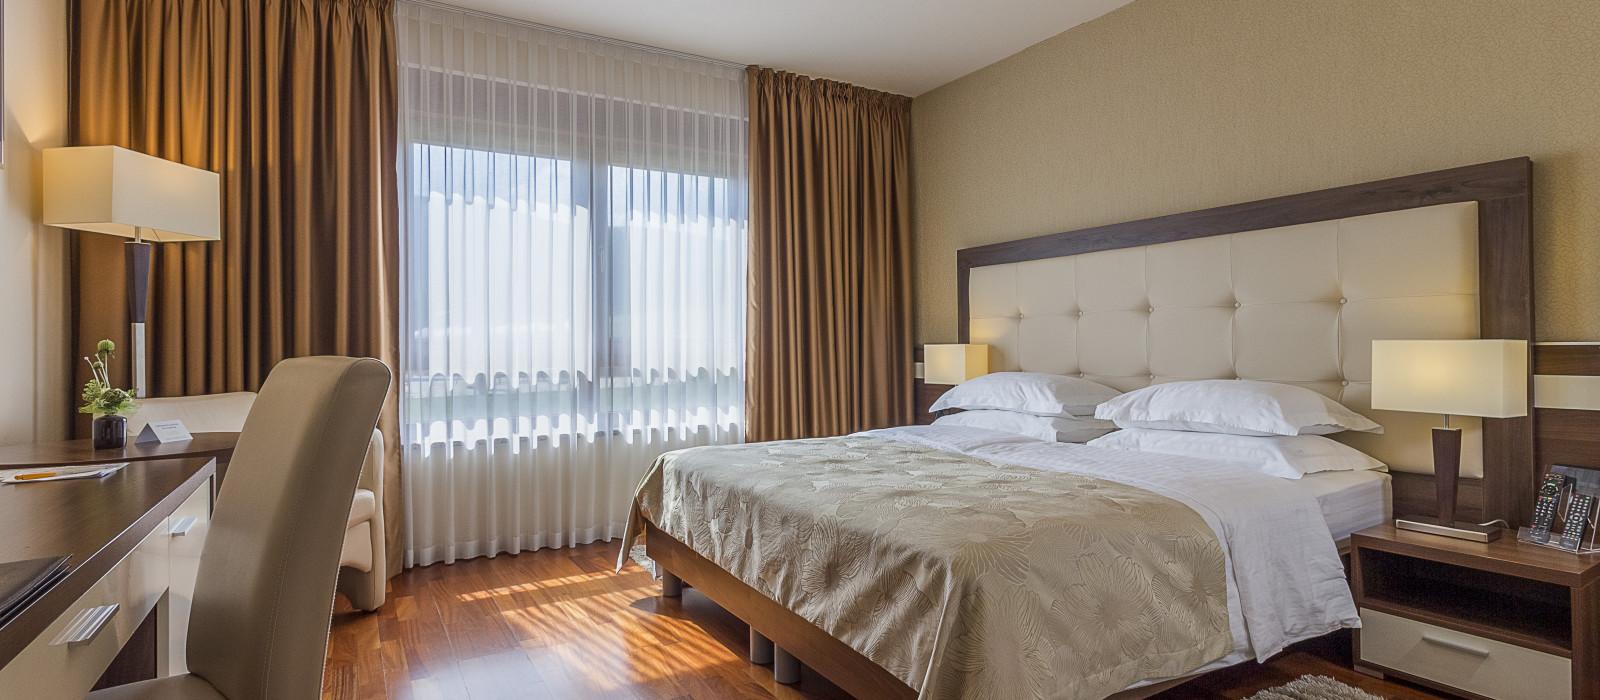 Hotel  Degenija Croatia & Slovenia